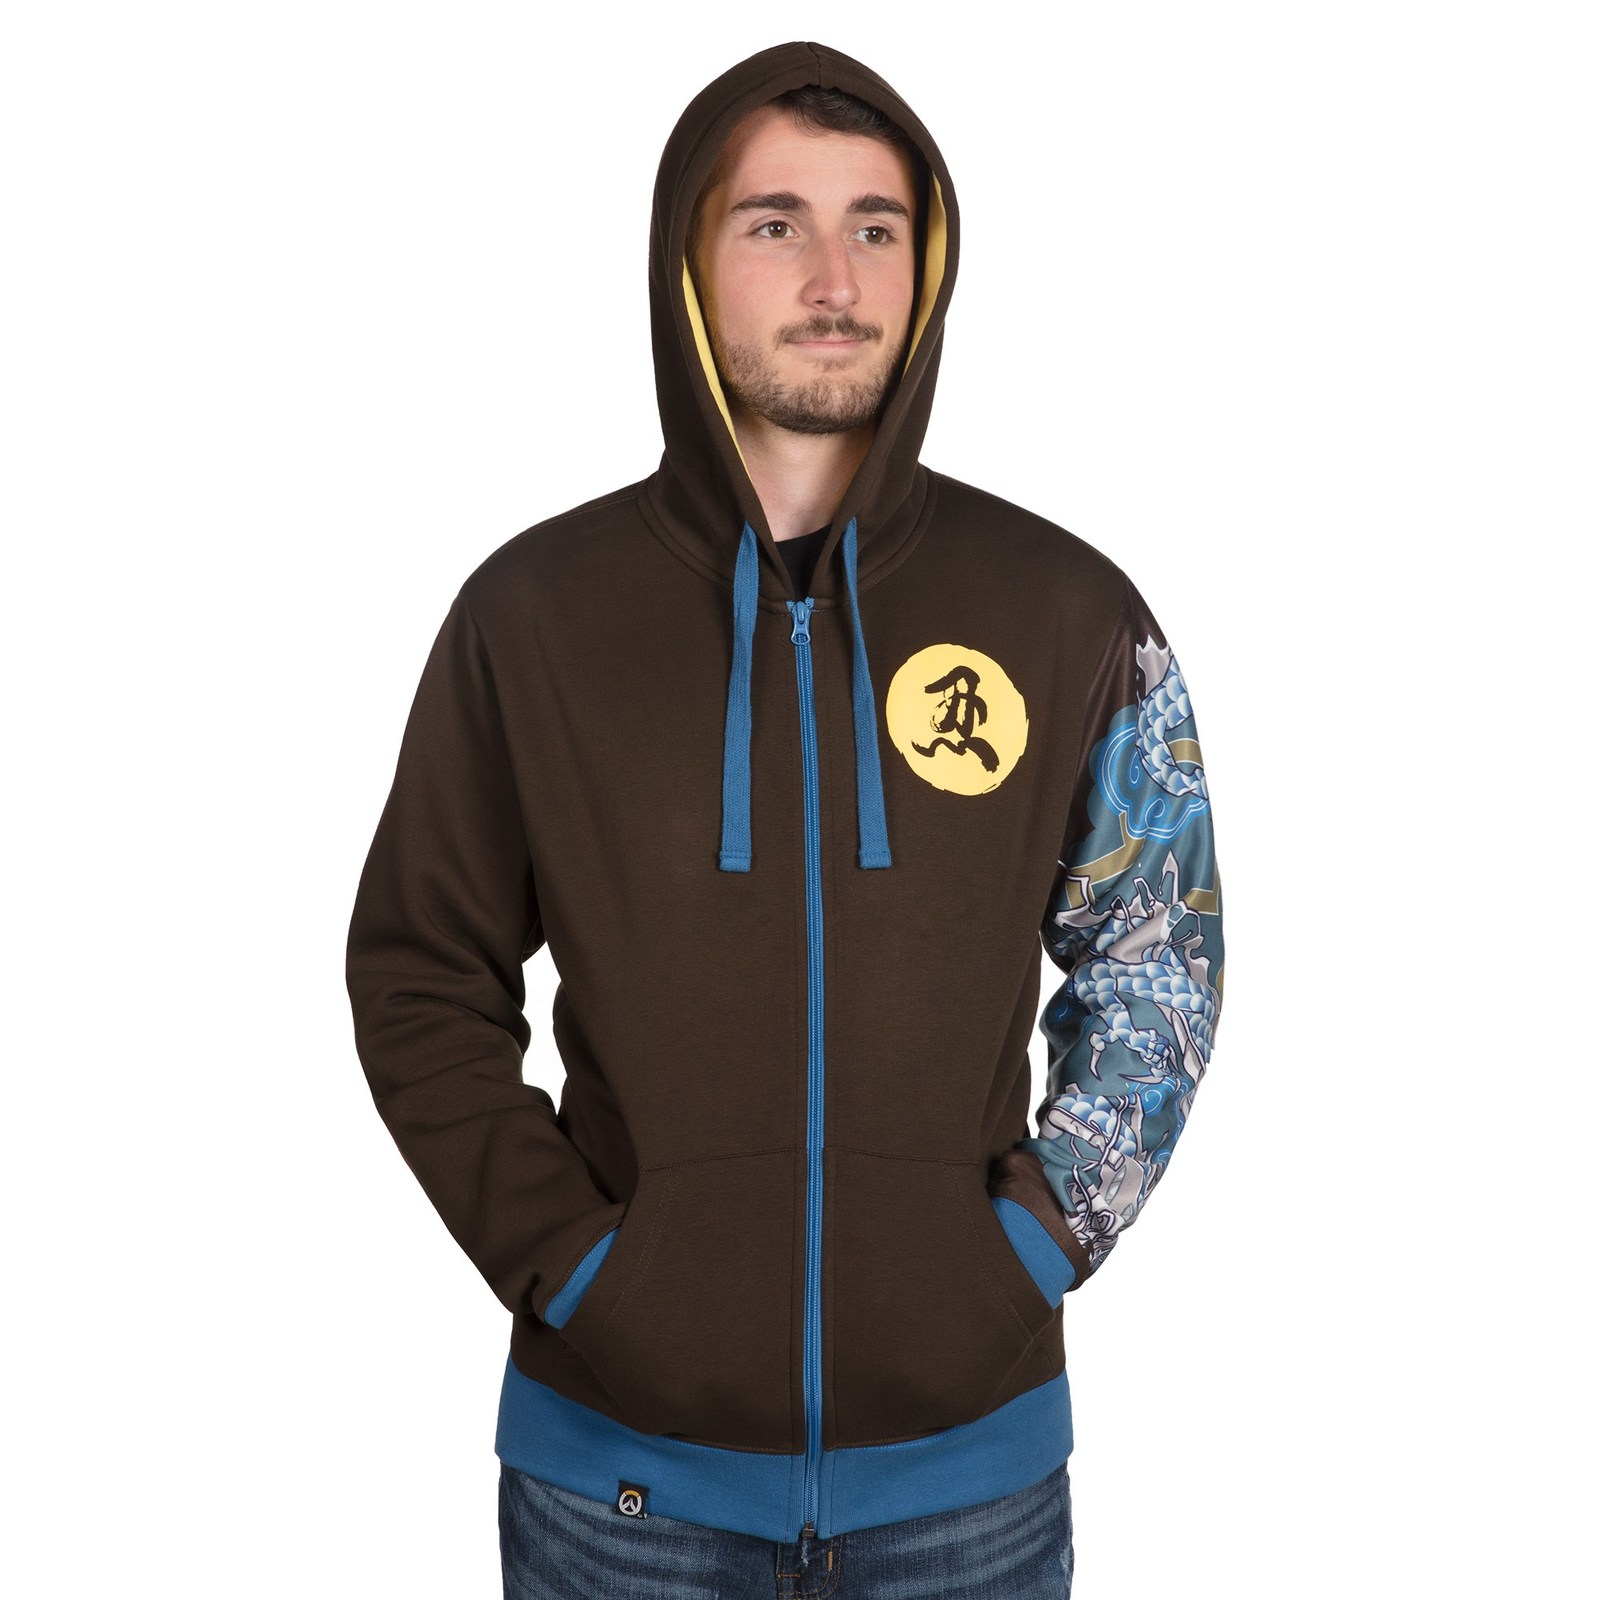 Overwatch Ultimate Hanzo Zip-Up Hoodie (2XL) image